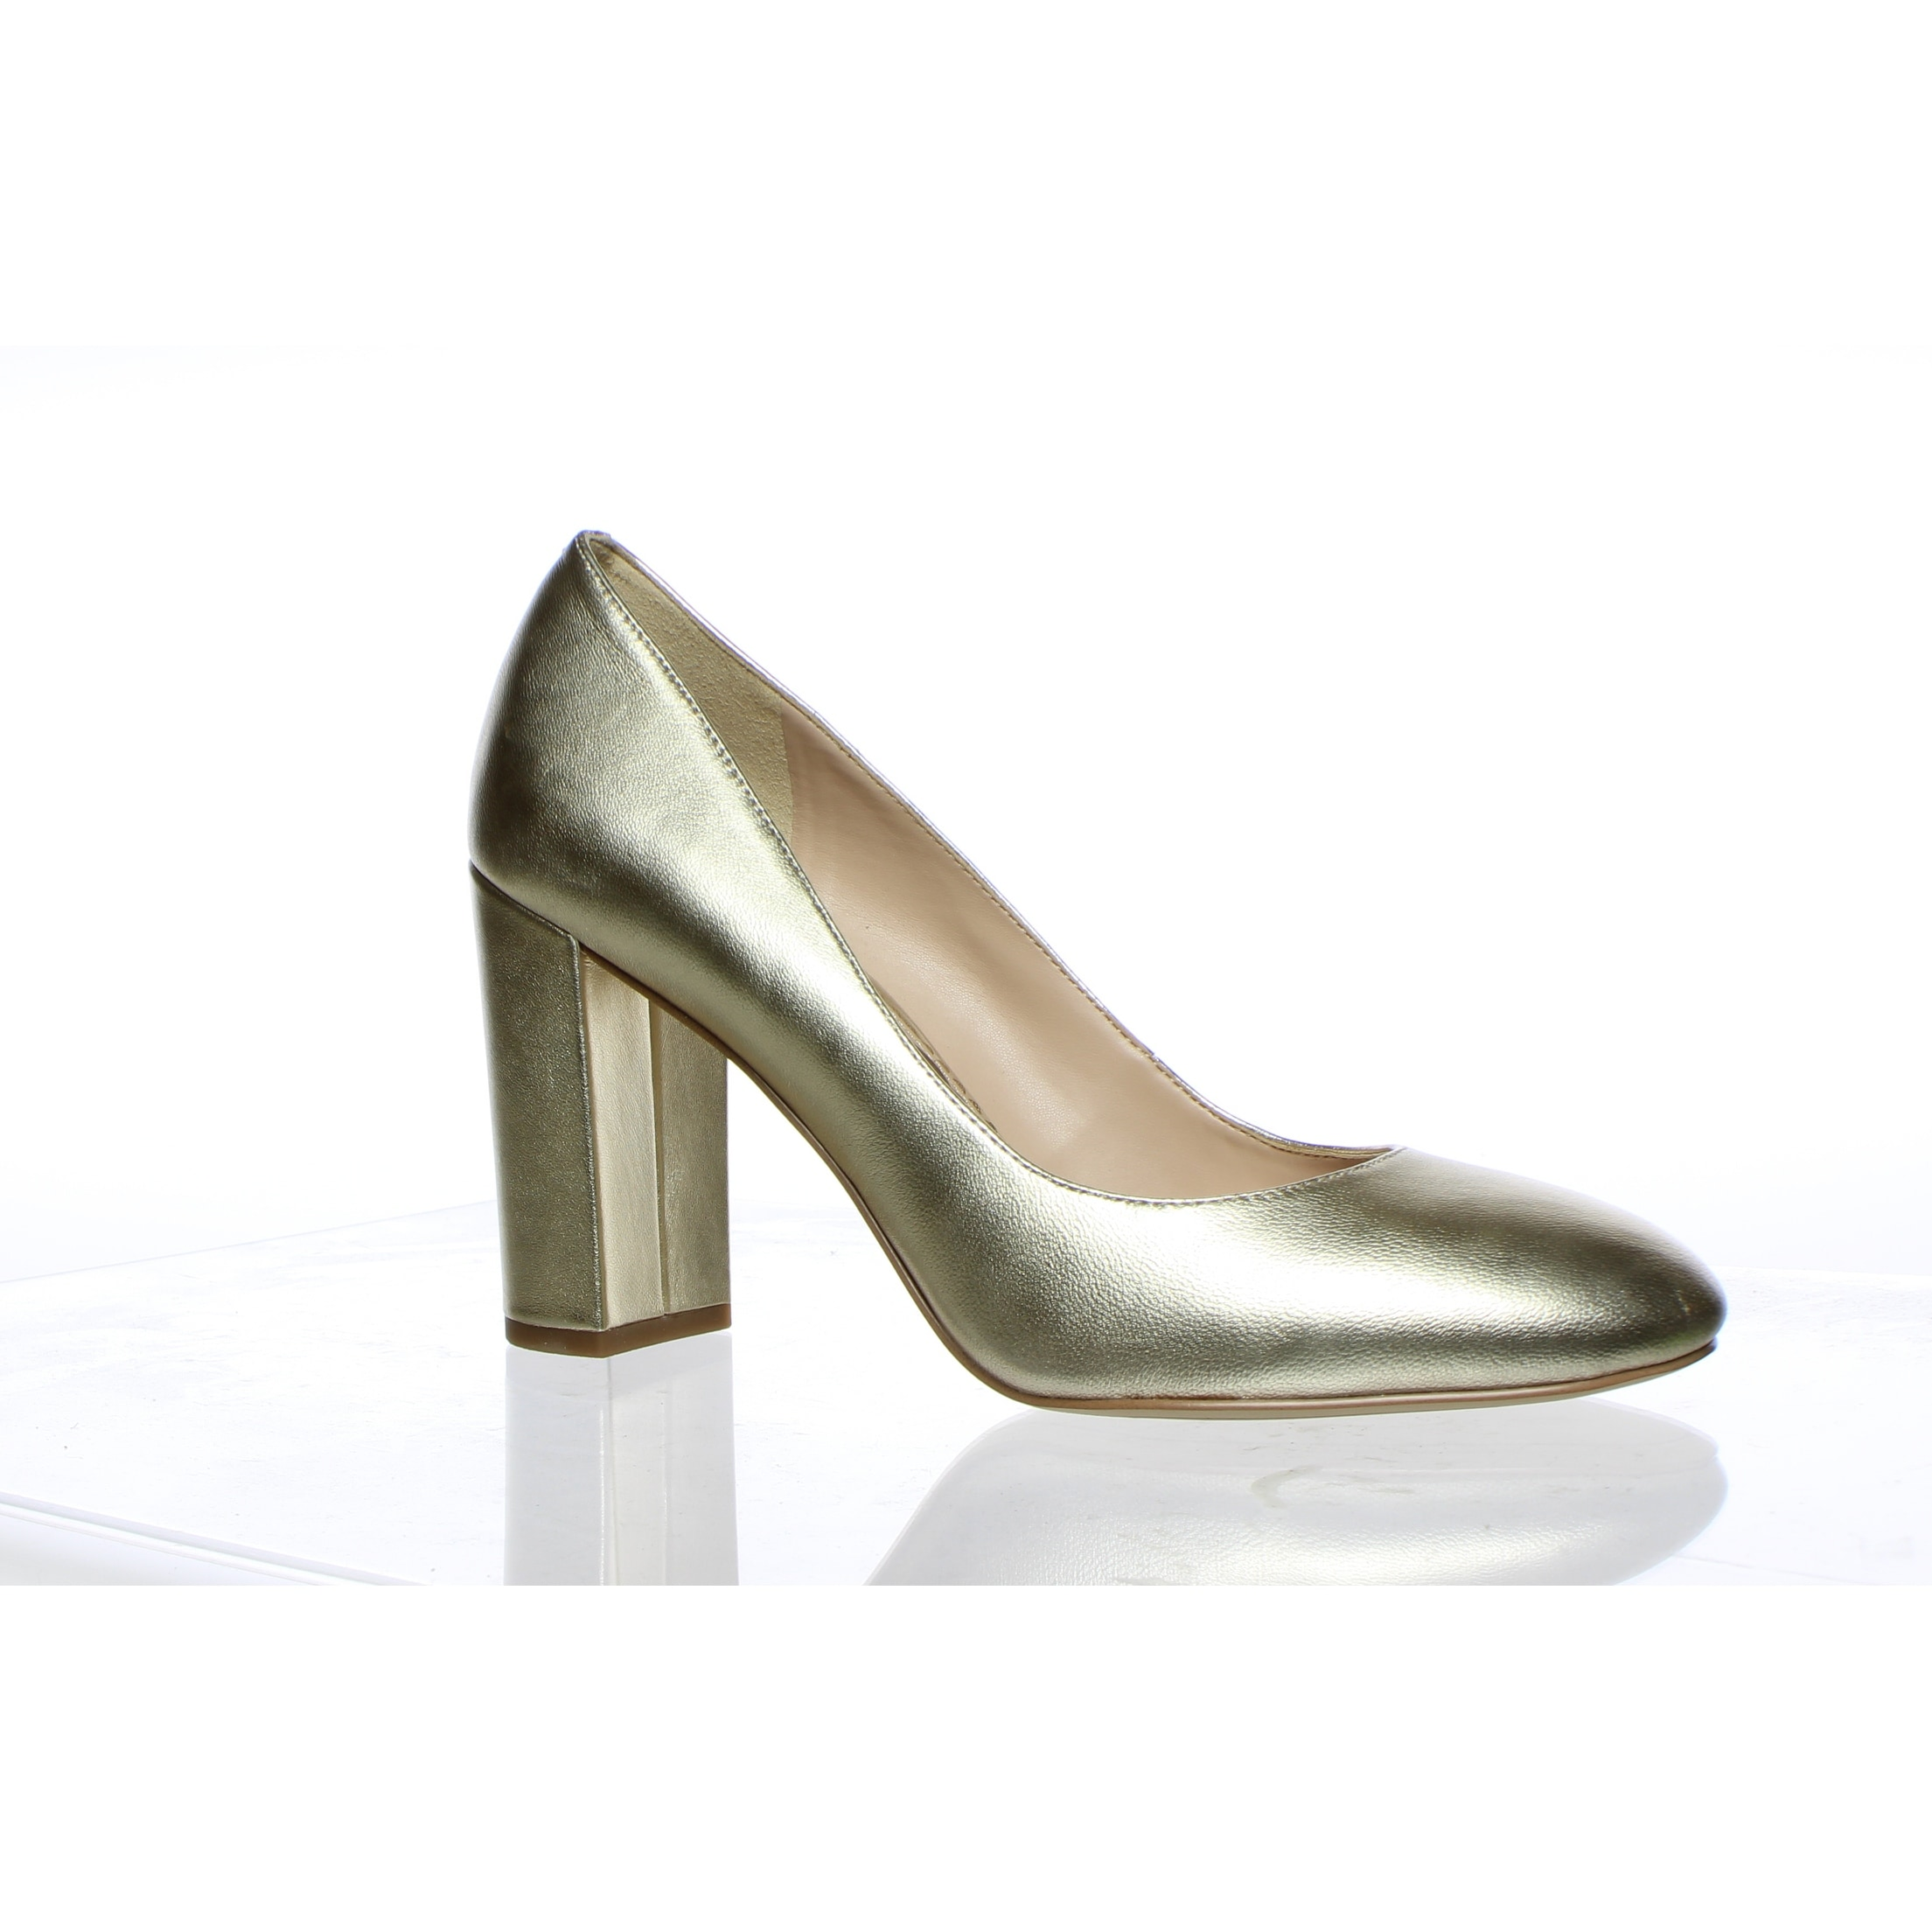 b7a6e600ce0a New Products - Sam Edelman Women s Shoes